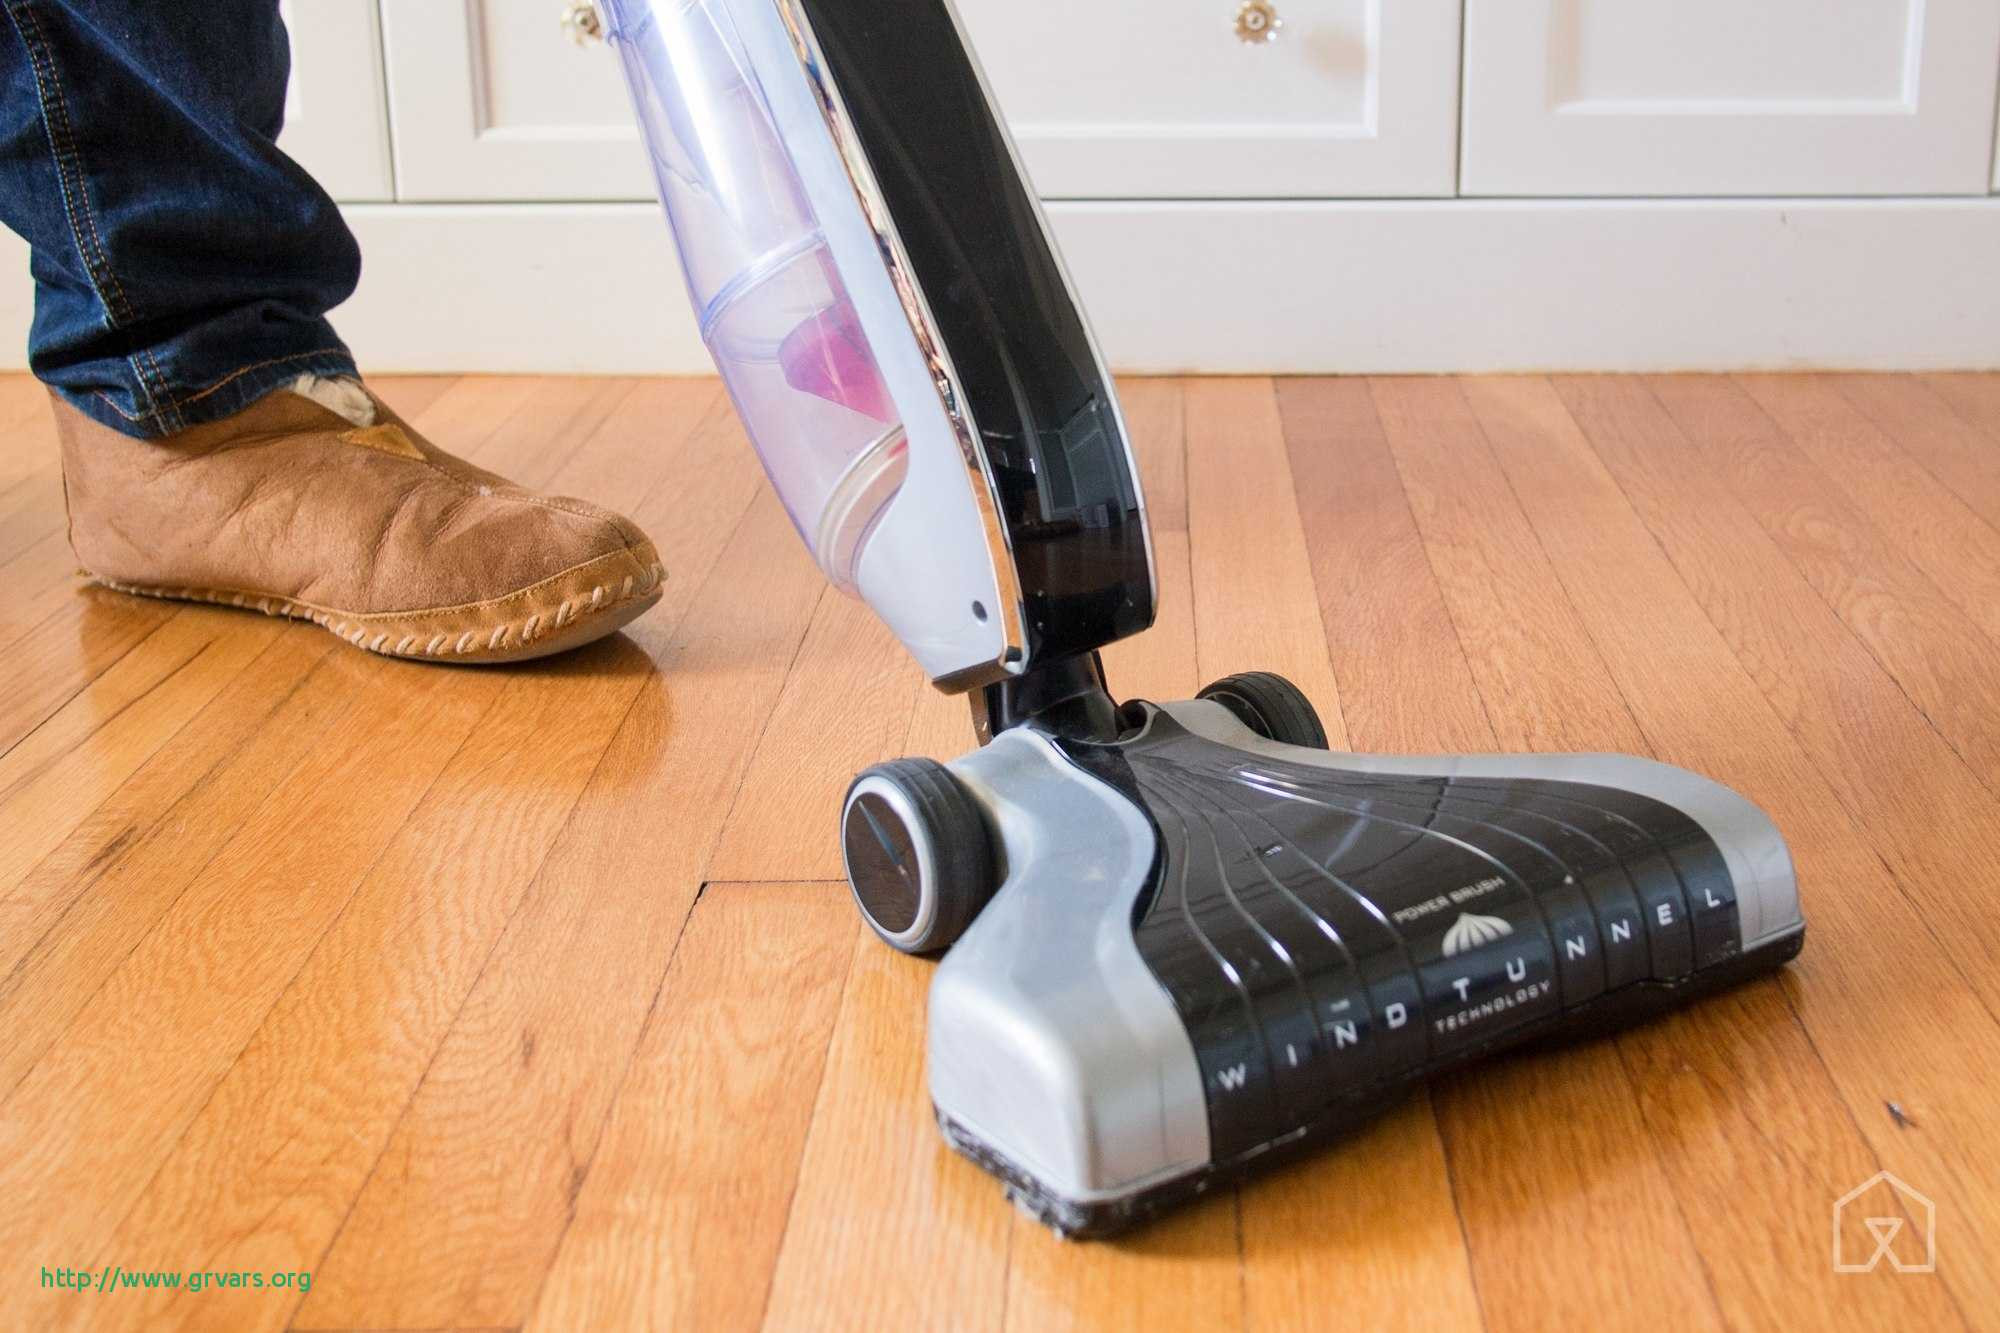 how to clean hardwood floors under carpet of 16 luxe good vacuum for carpet and hardwood floor ideas blog in 16 photos of the 16 luxe good vacuum for carpet and hardwood floor